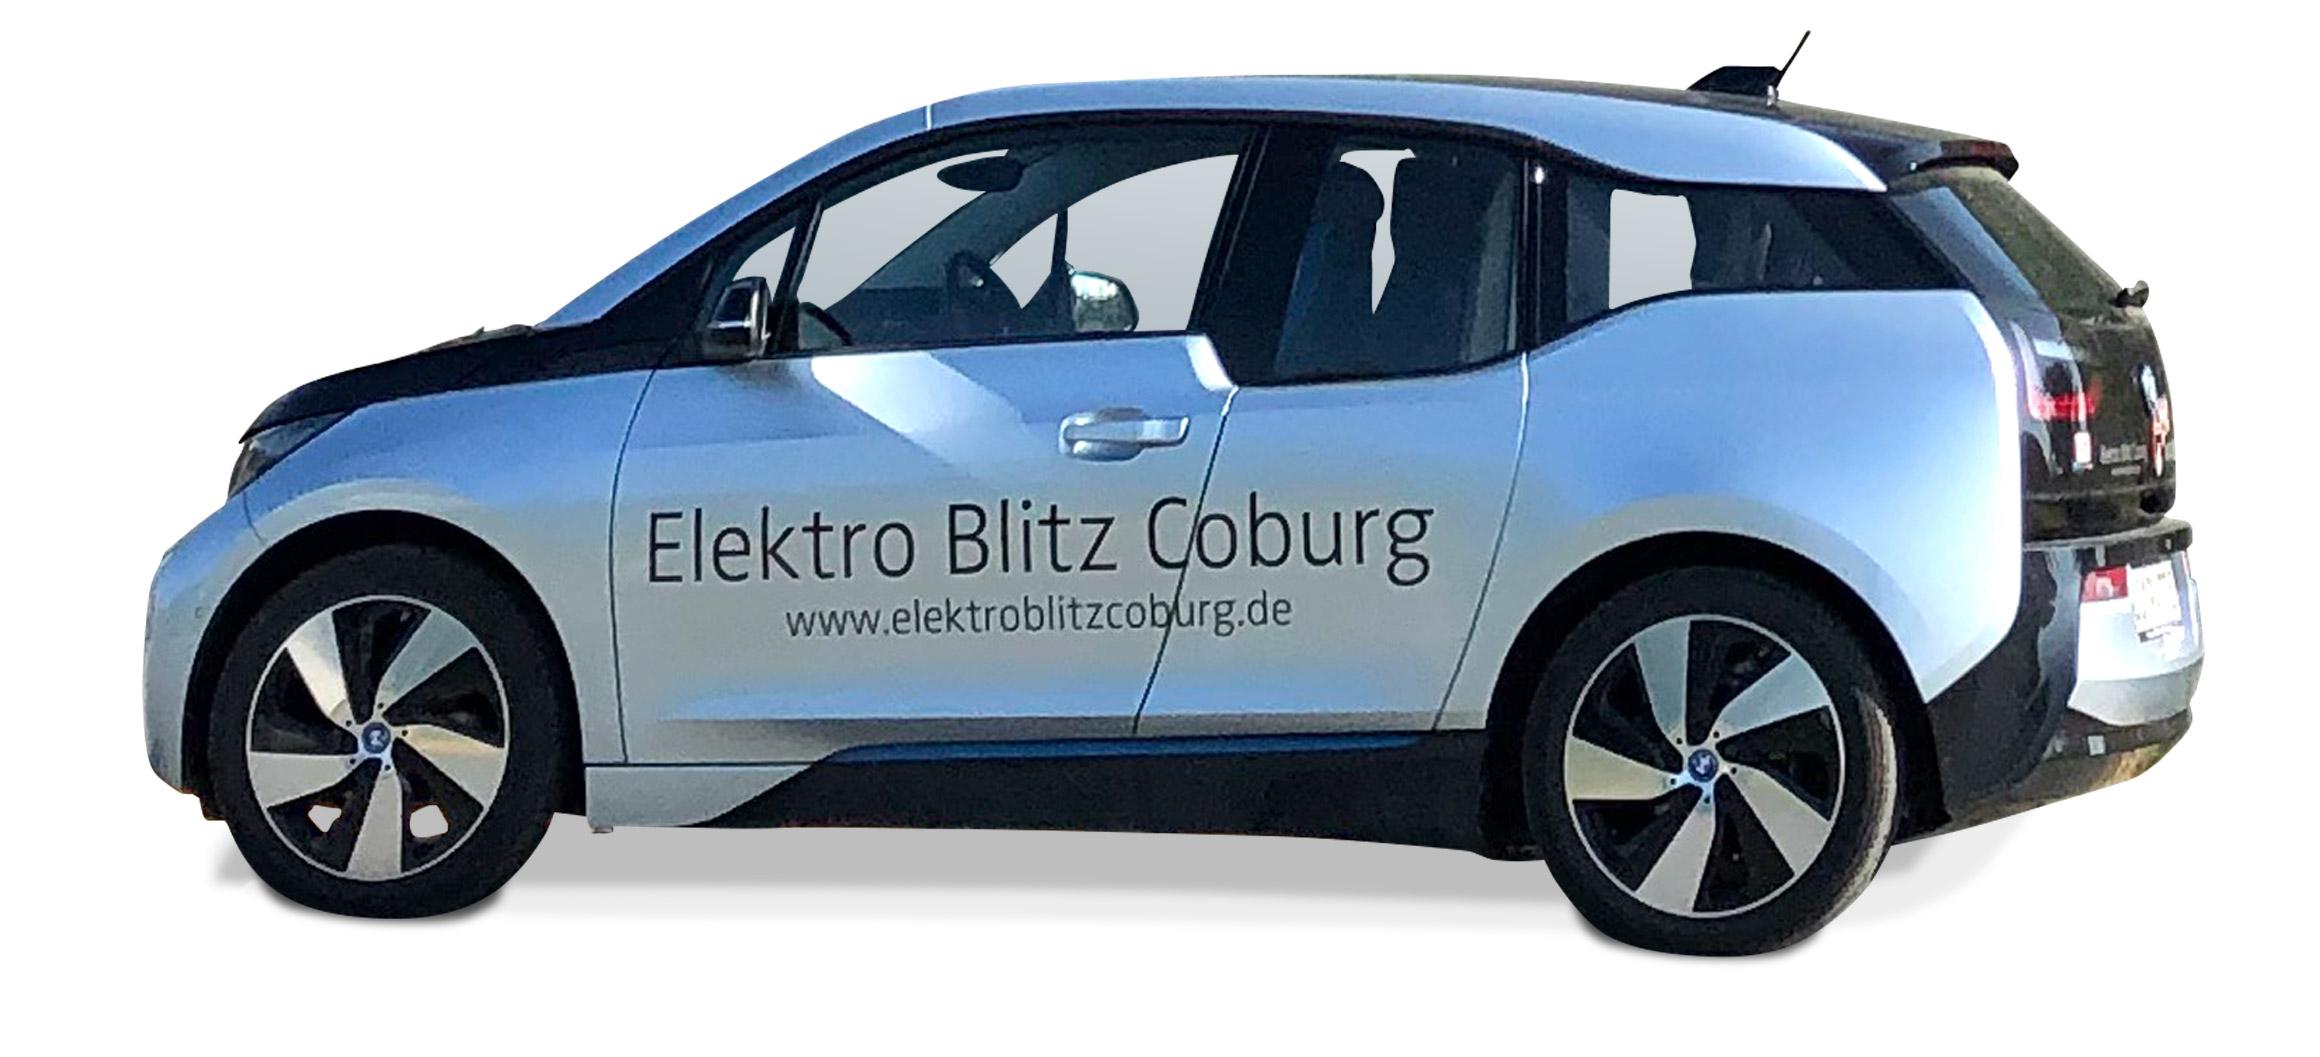 Photovoltaik Systeme für e-Mobilität